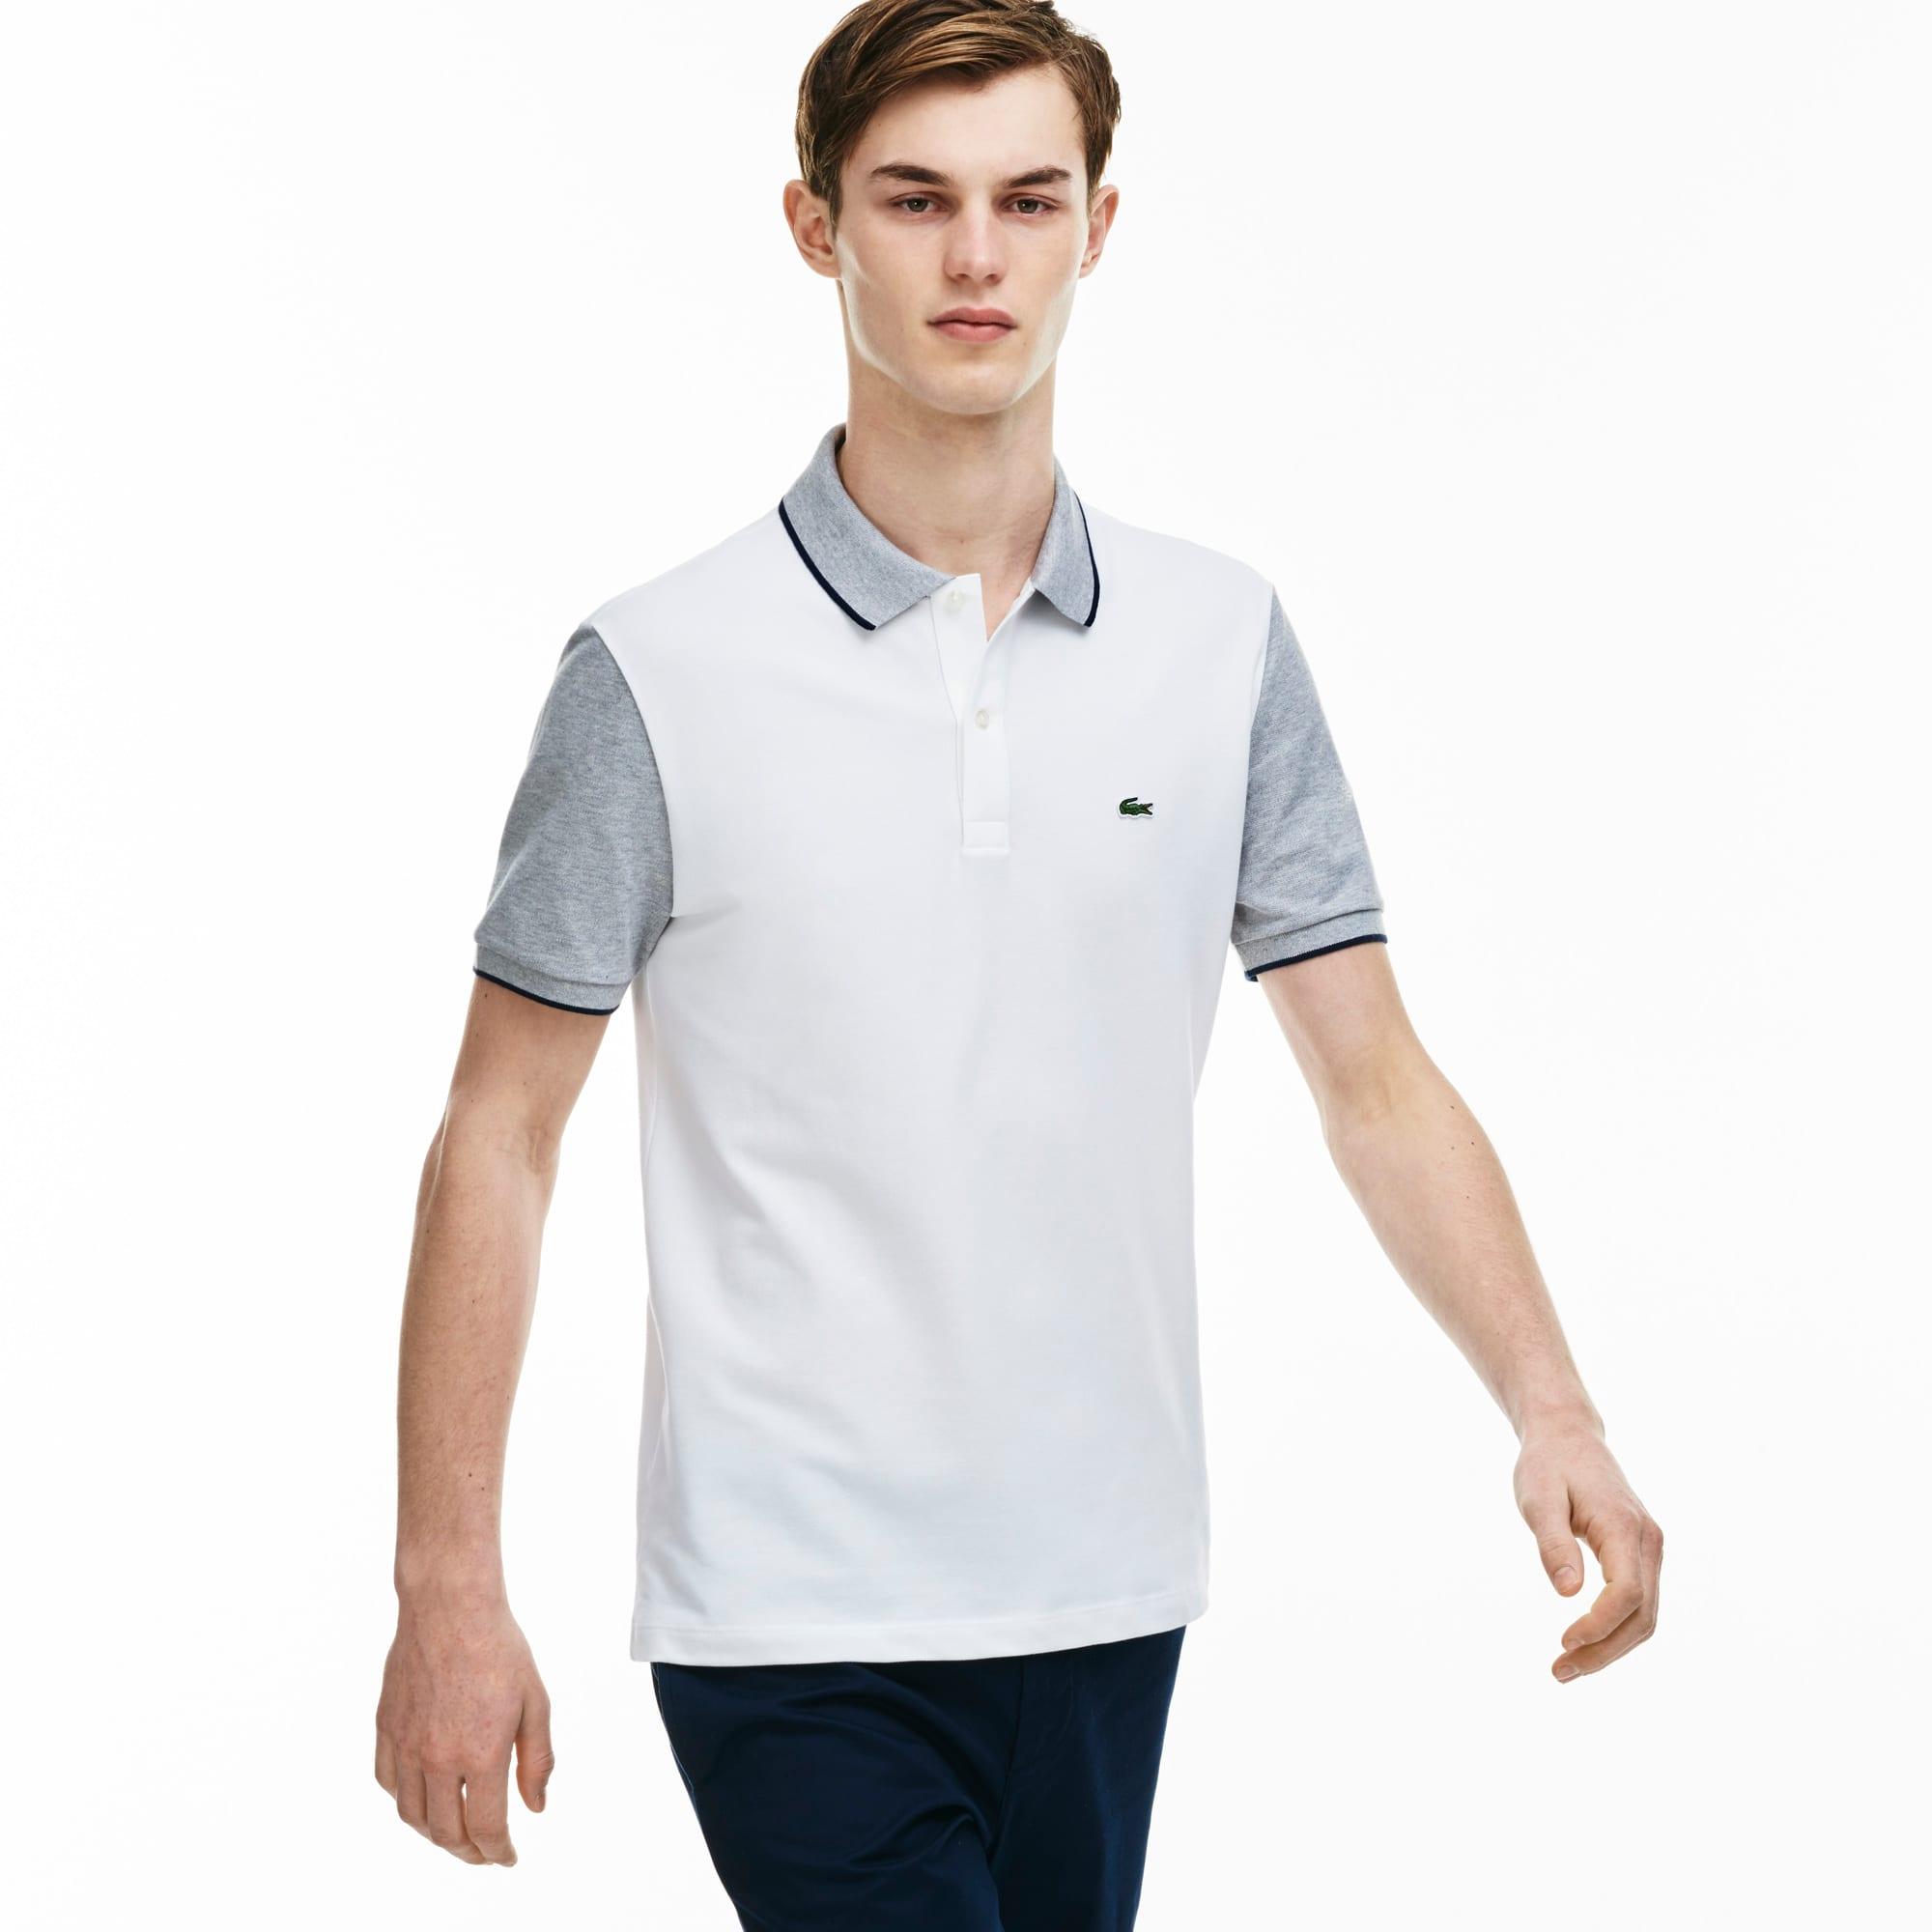 Men's Slim Fit Contrast Sleeves Stretch Piqué Polo Shirt